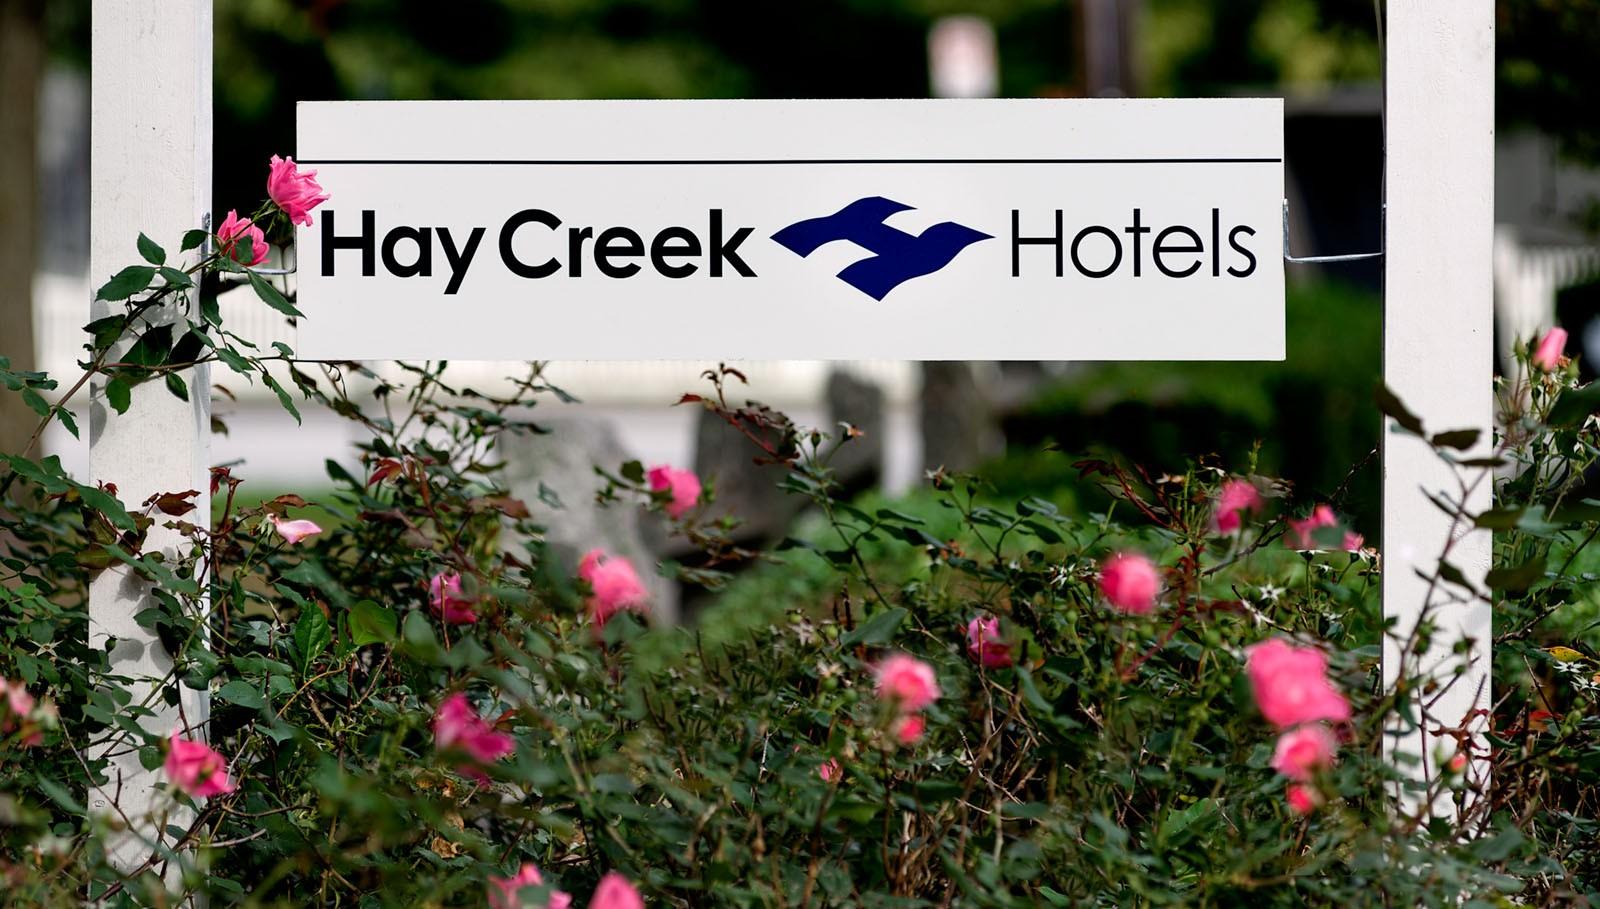 Hay Creek Hotels   LinkedIn